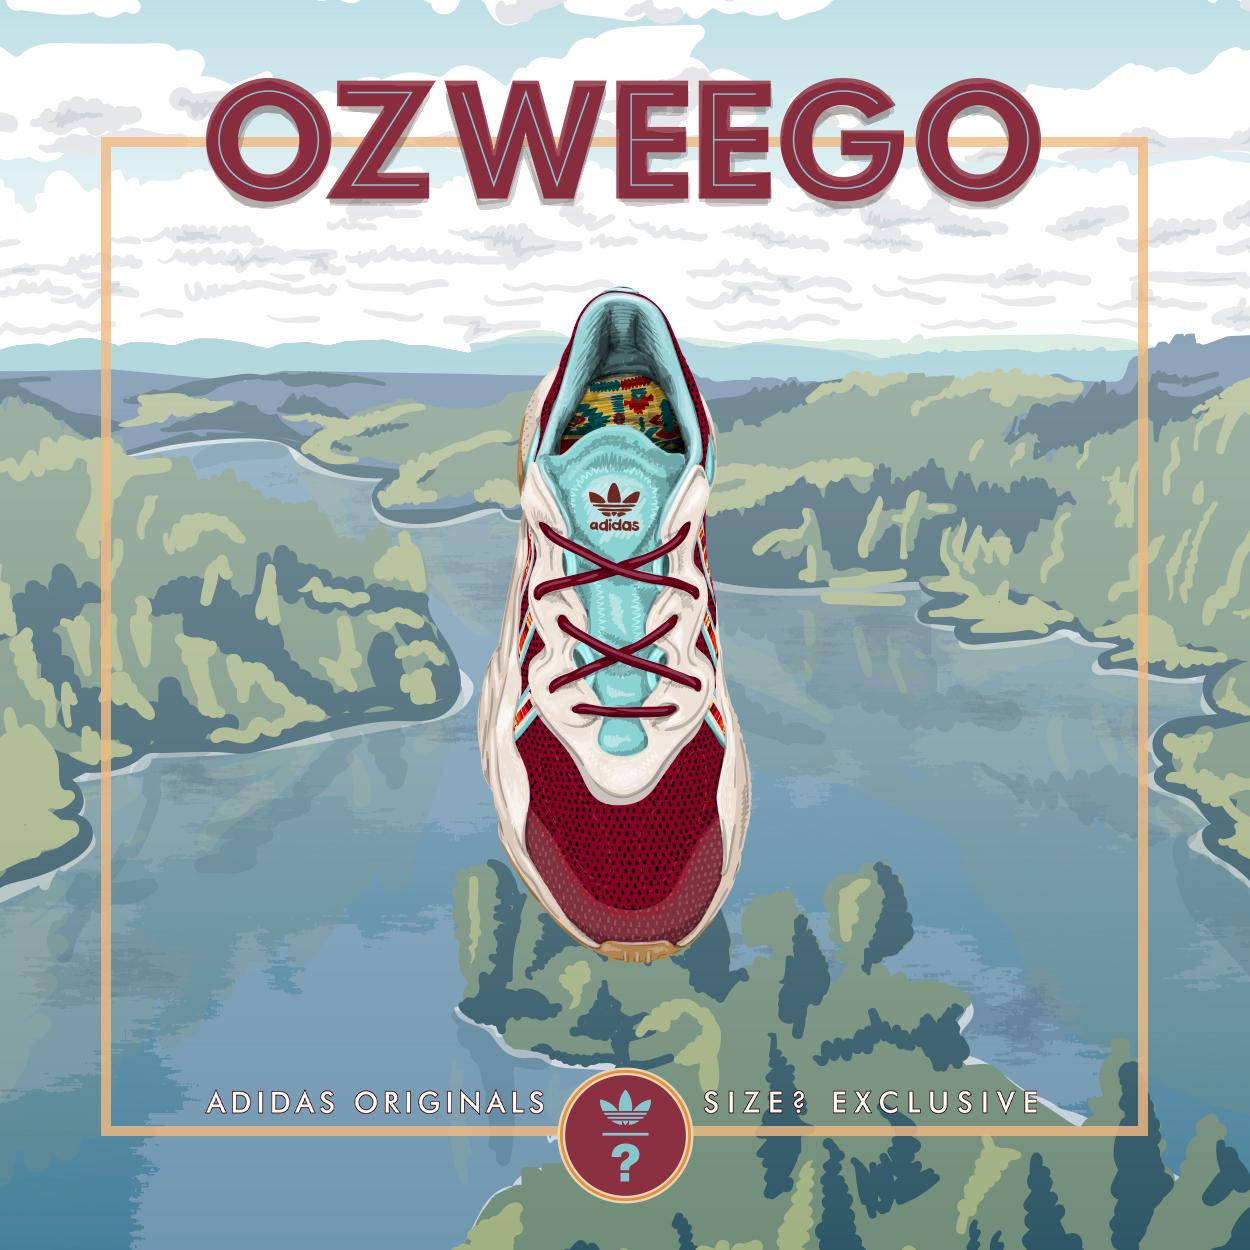 adidas Originals Ozweego – size? Exclusive